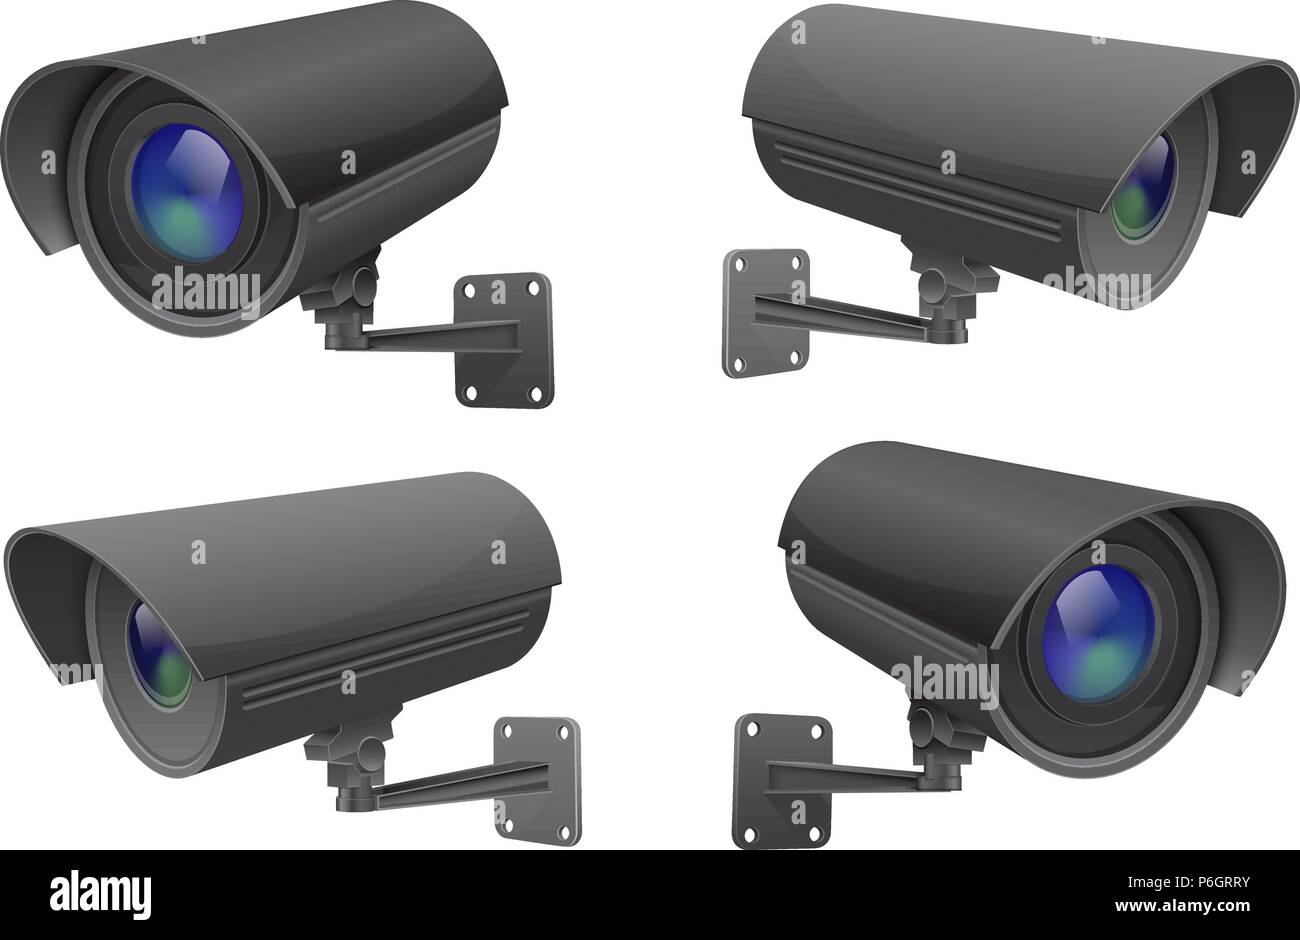 Security camera set. Black CCTV surveillance system - Stock Vector